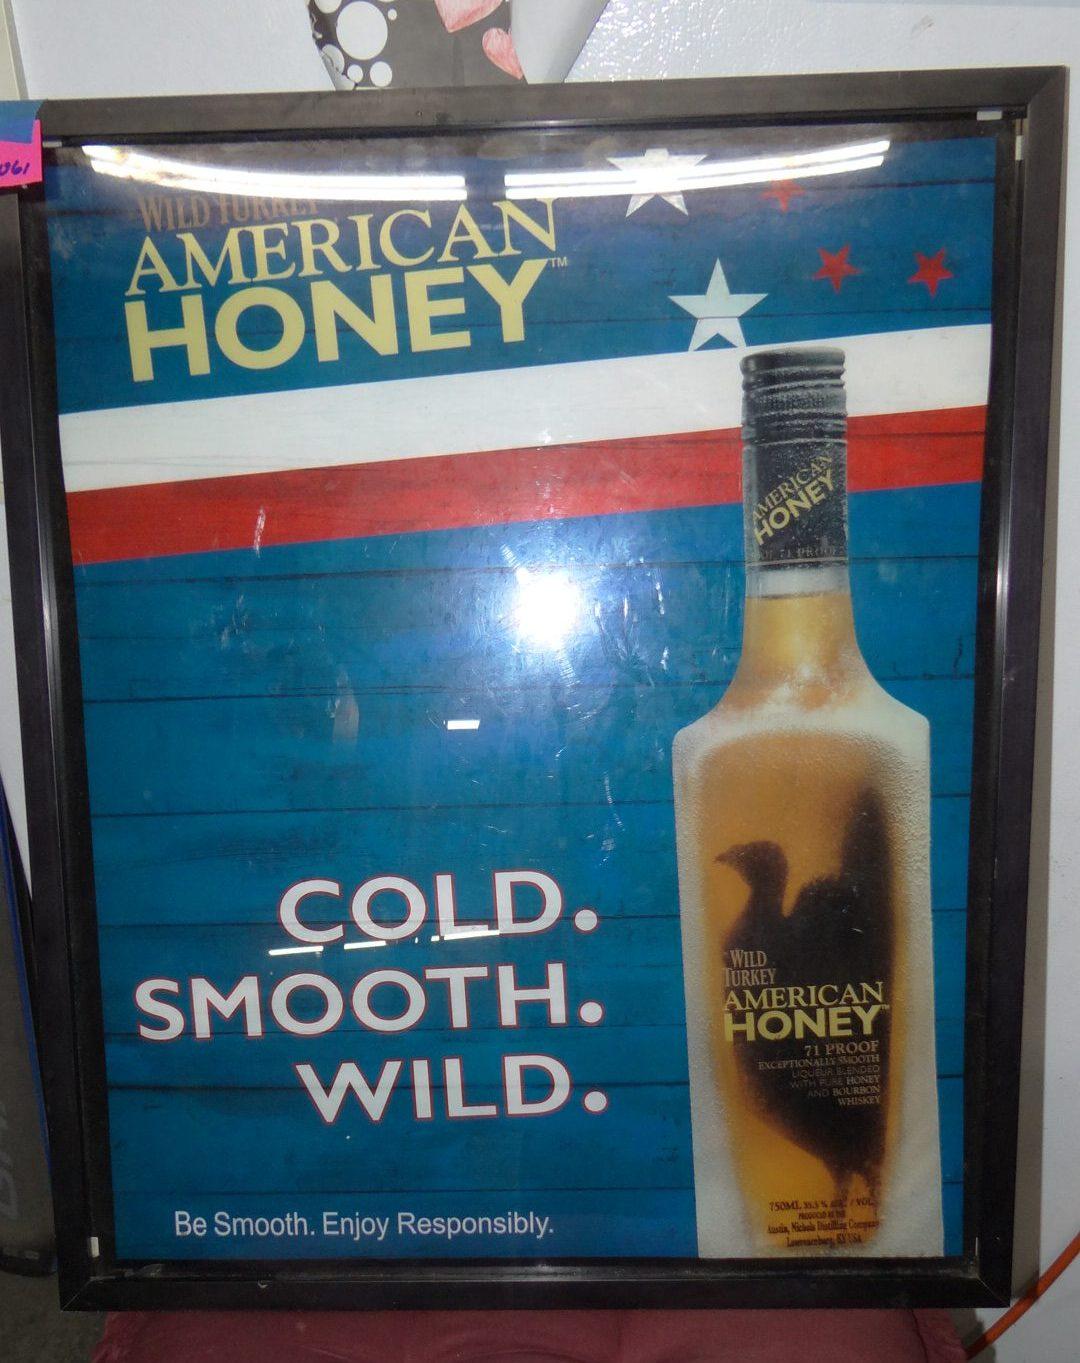 1061-Wild Turkey American Honey Framed & Lighted Sign 24in x 20in